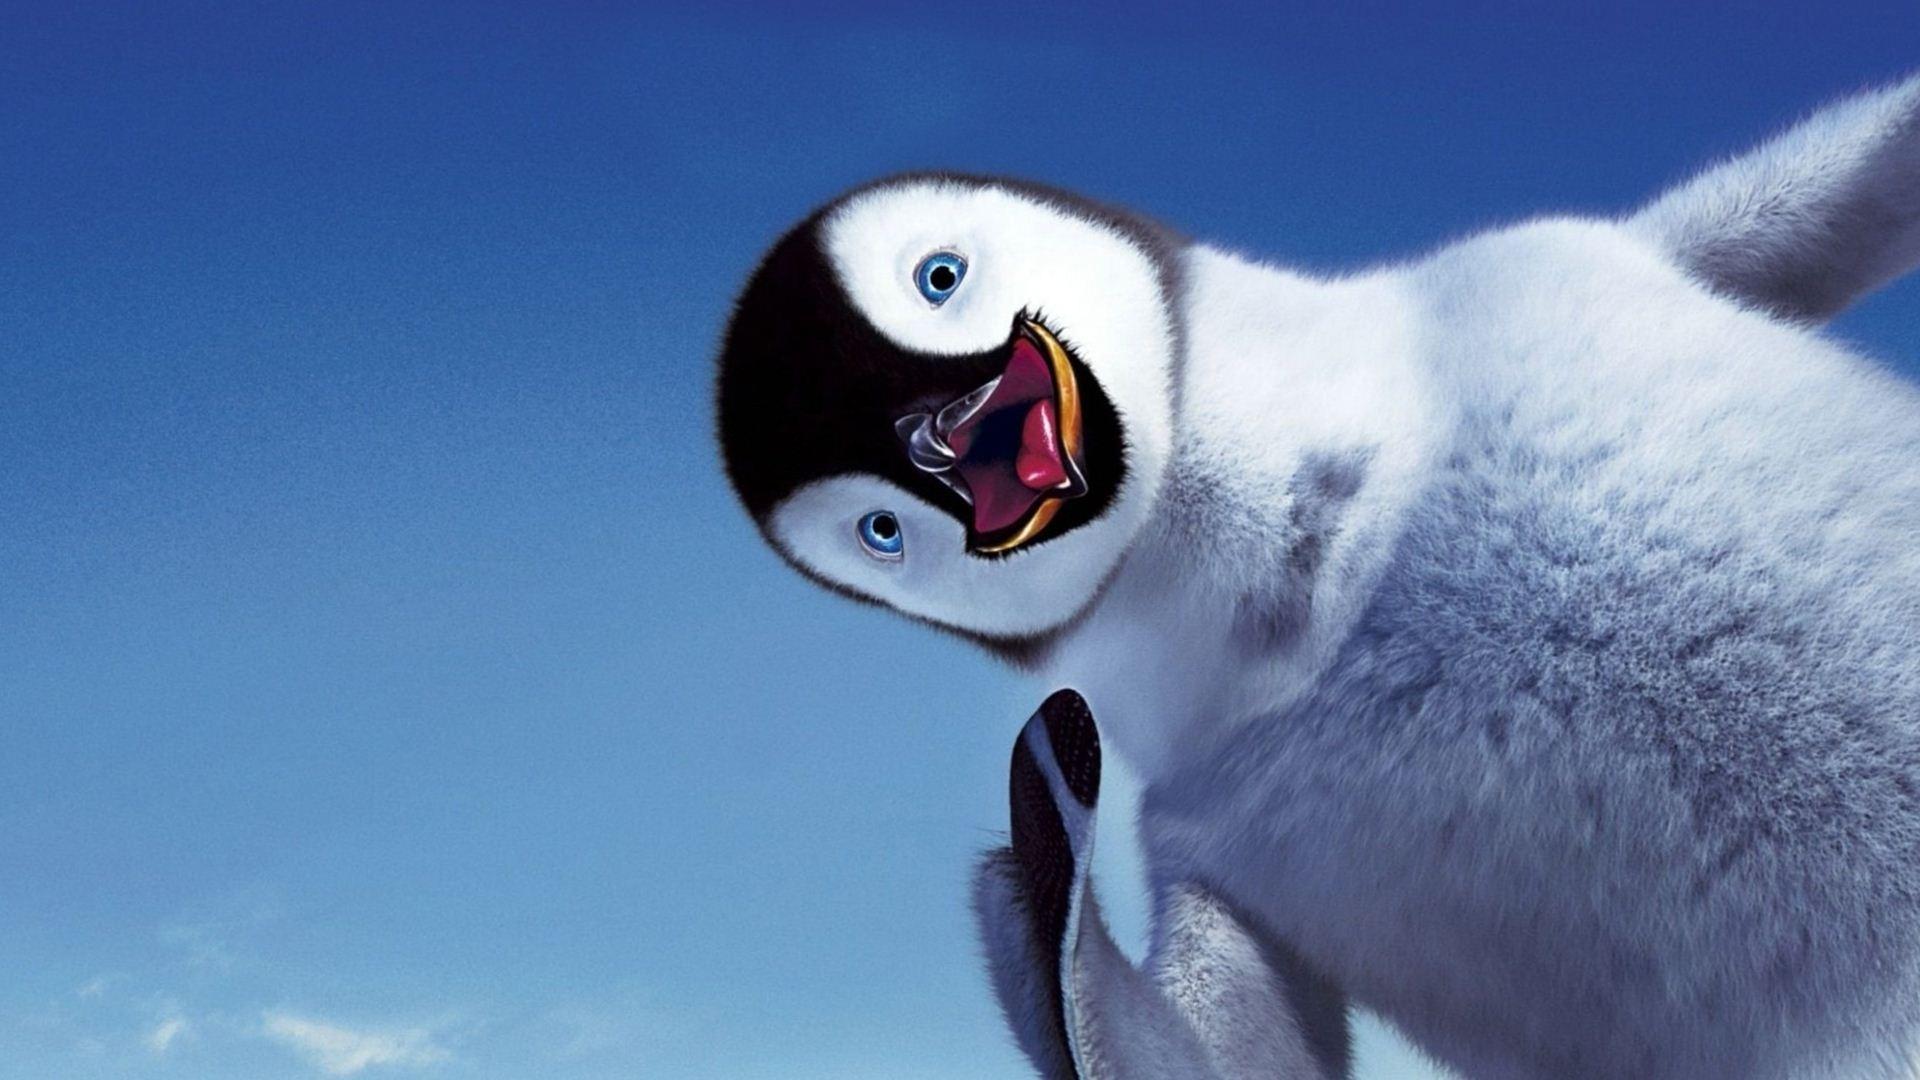 Cute Baby Pics For Whatsapp Wallpaper Penguin Backgrounds Hd Pixelstalk Net